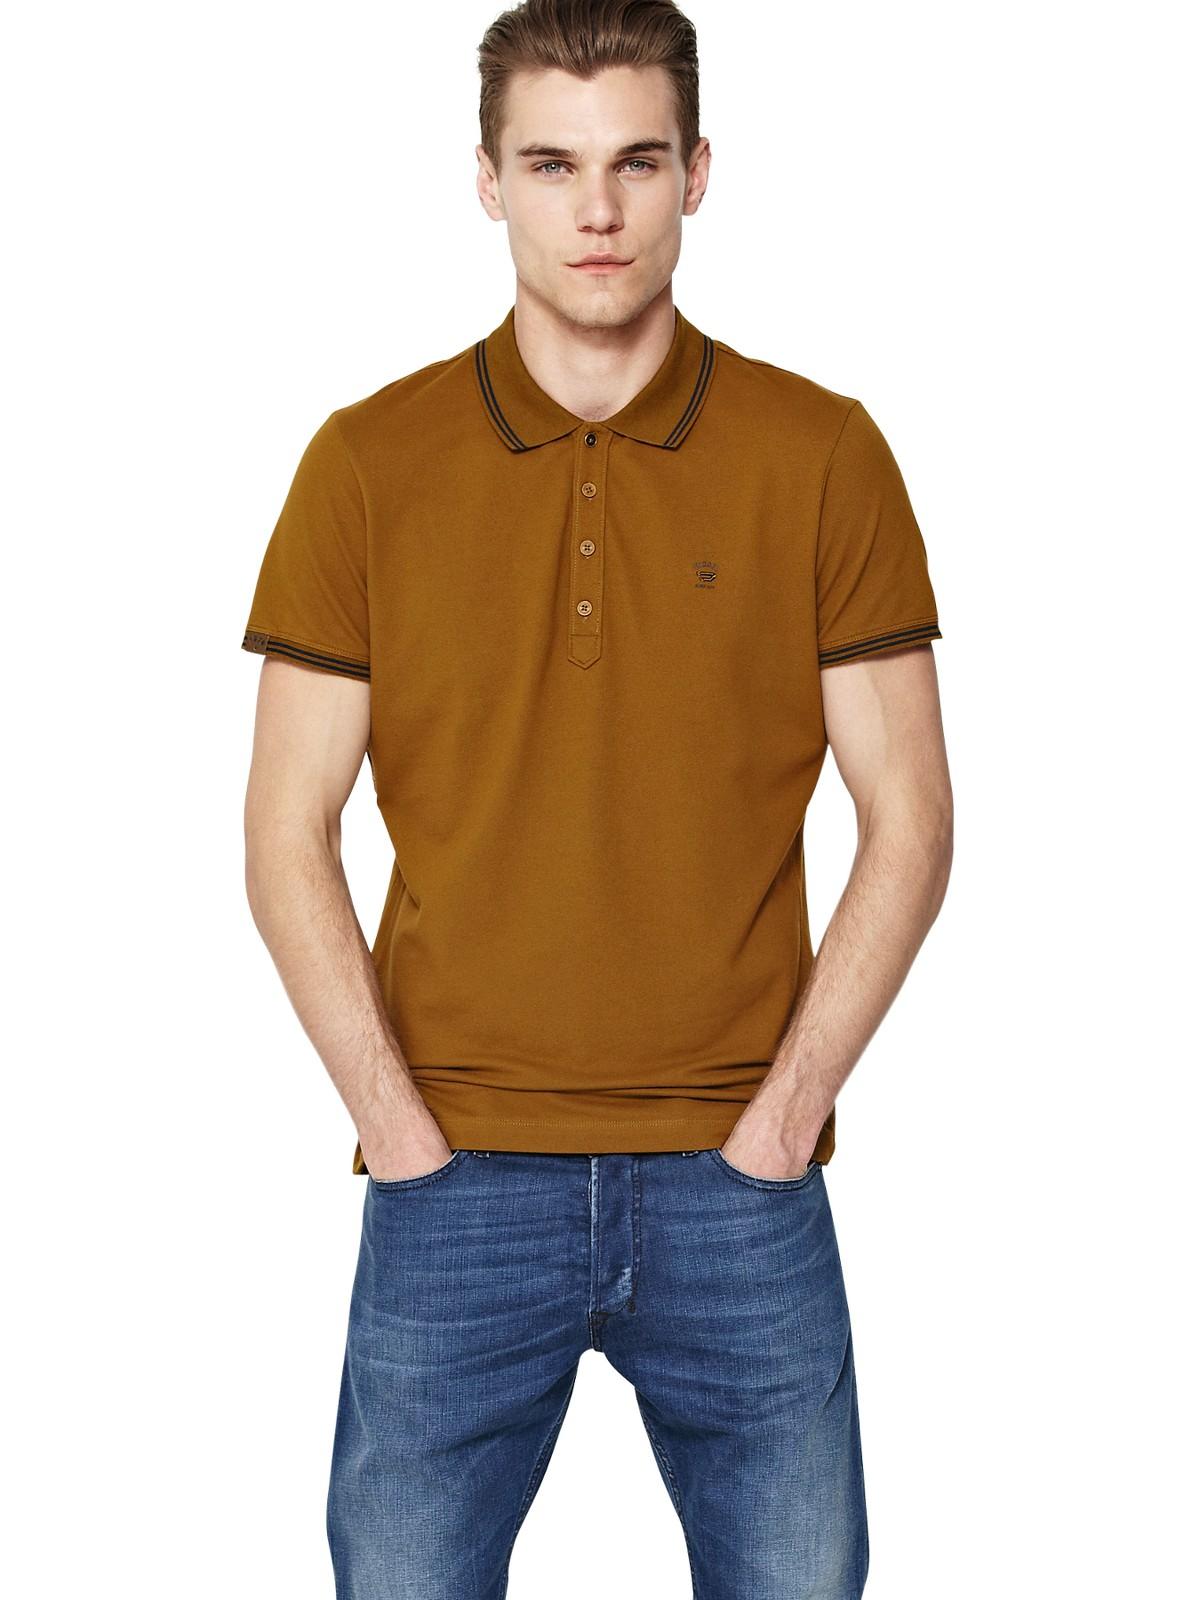 diesel diesel tnyx tipped mens polo shirt in orange for men mustard lyst. Black Bedroom Furniture Sets. Home Design Ideas